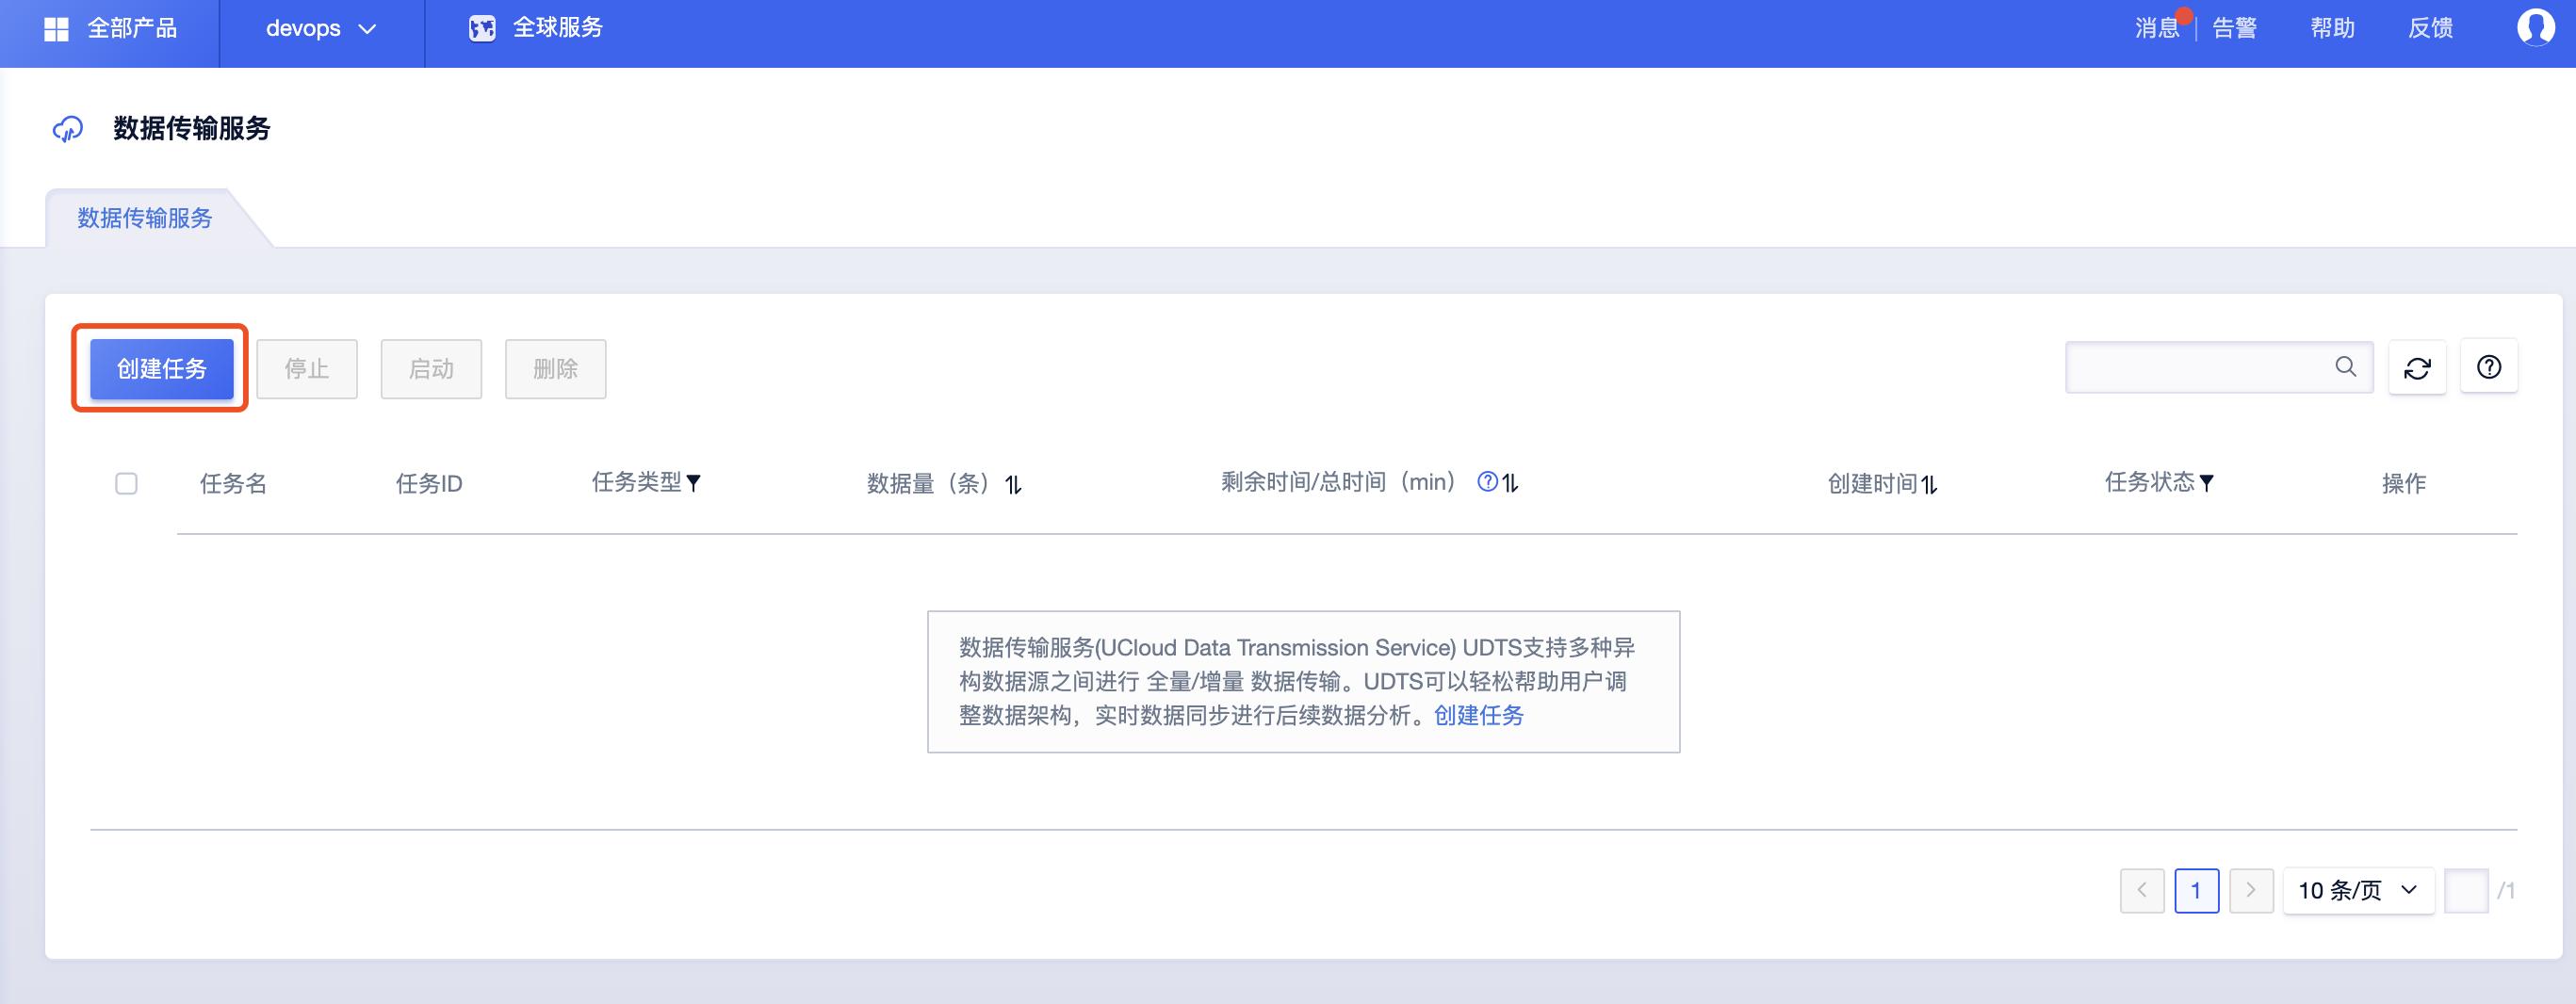 UCloud数据传输服务UDTS快速上手操作指南